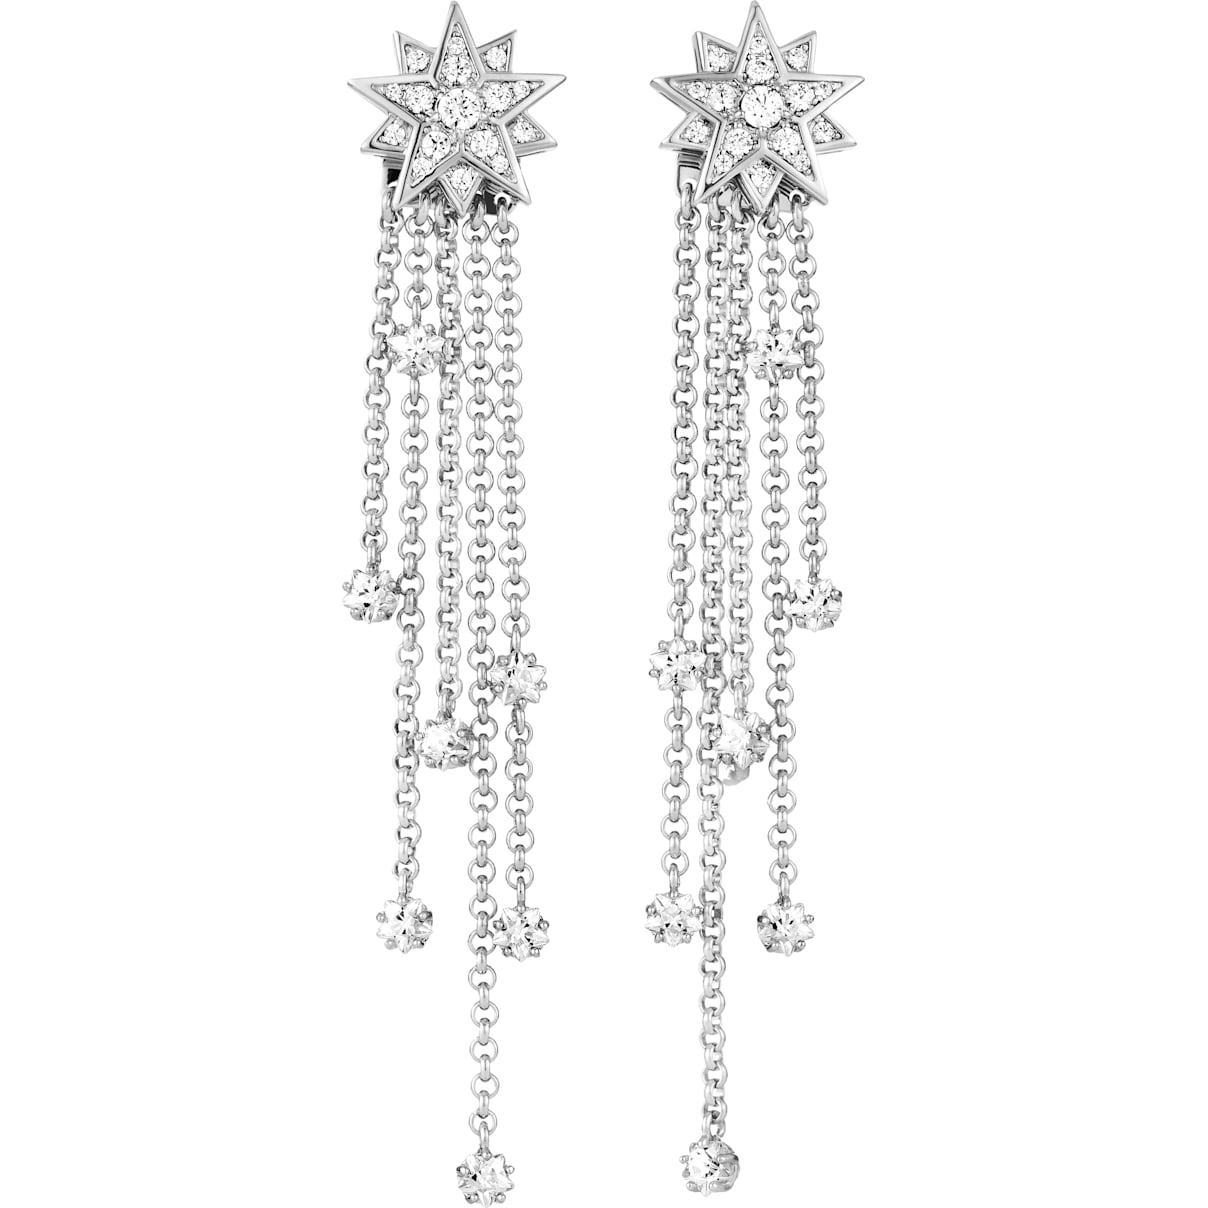 Swarovski Penélope Cruz Moonsun Strand Pierced Earrings, Limited Edition, White, Rhodium plated